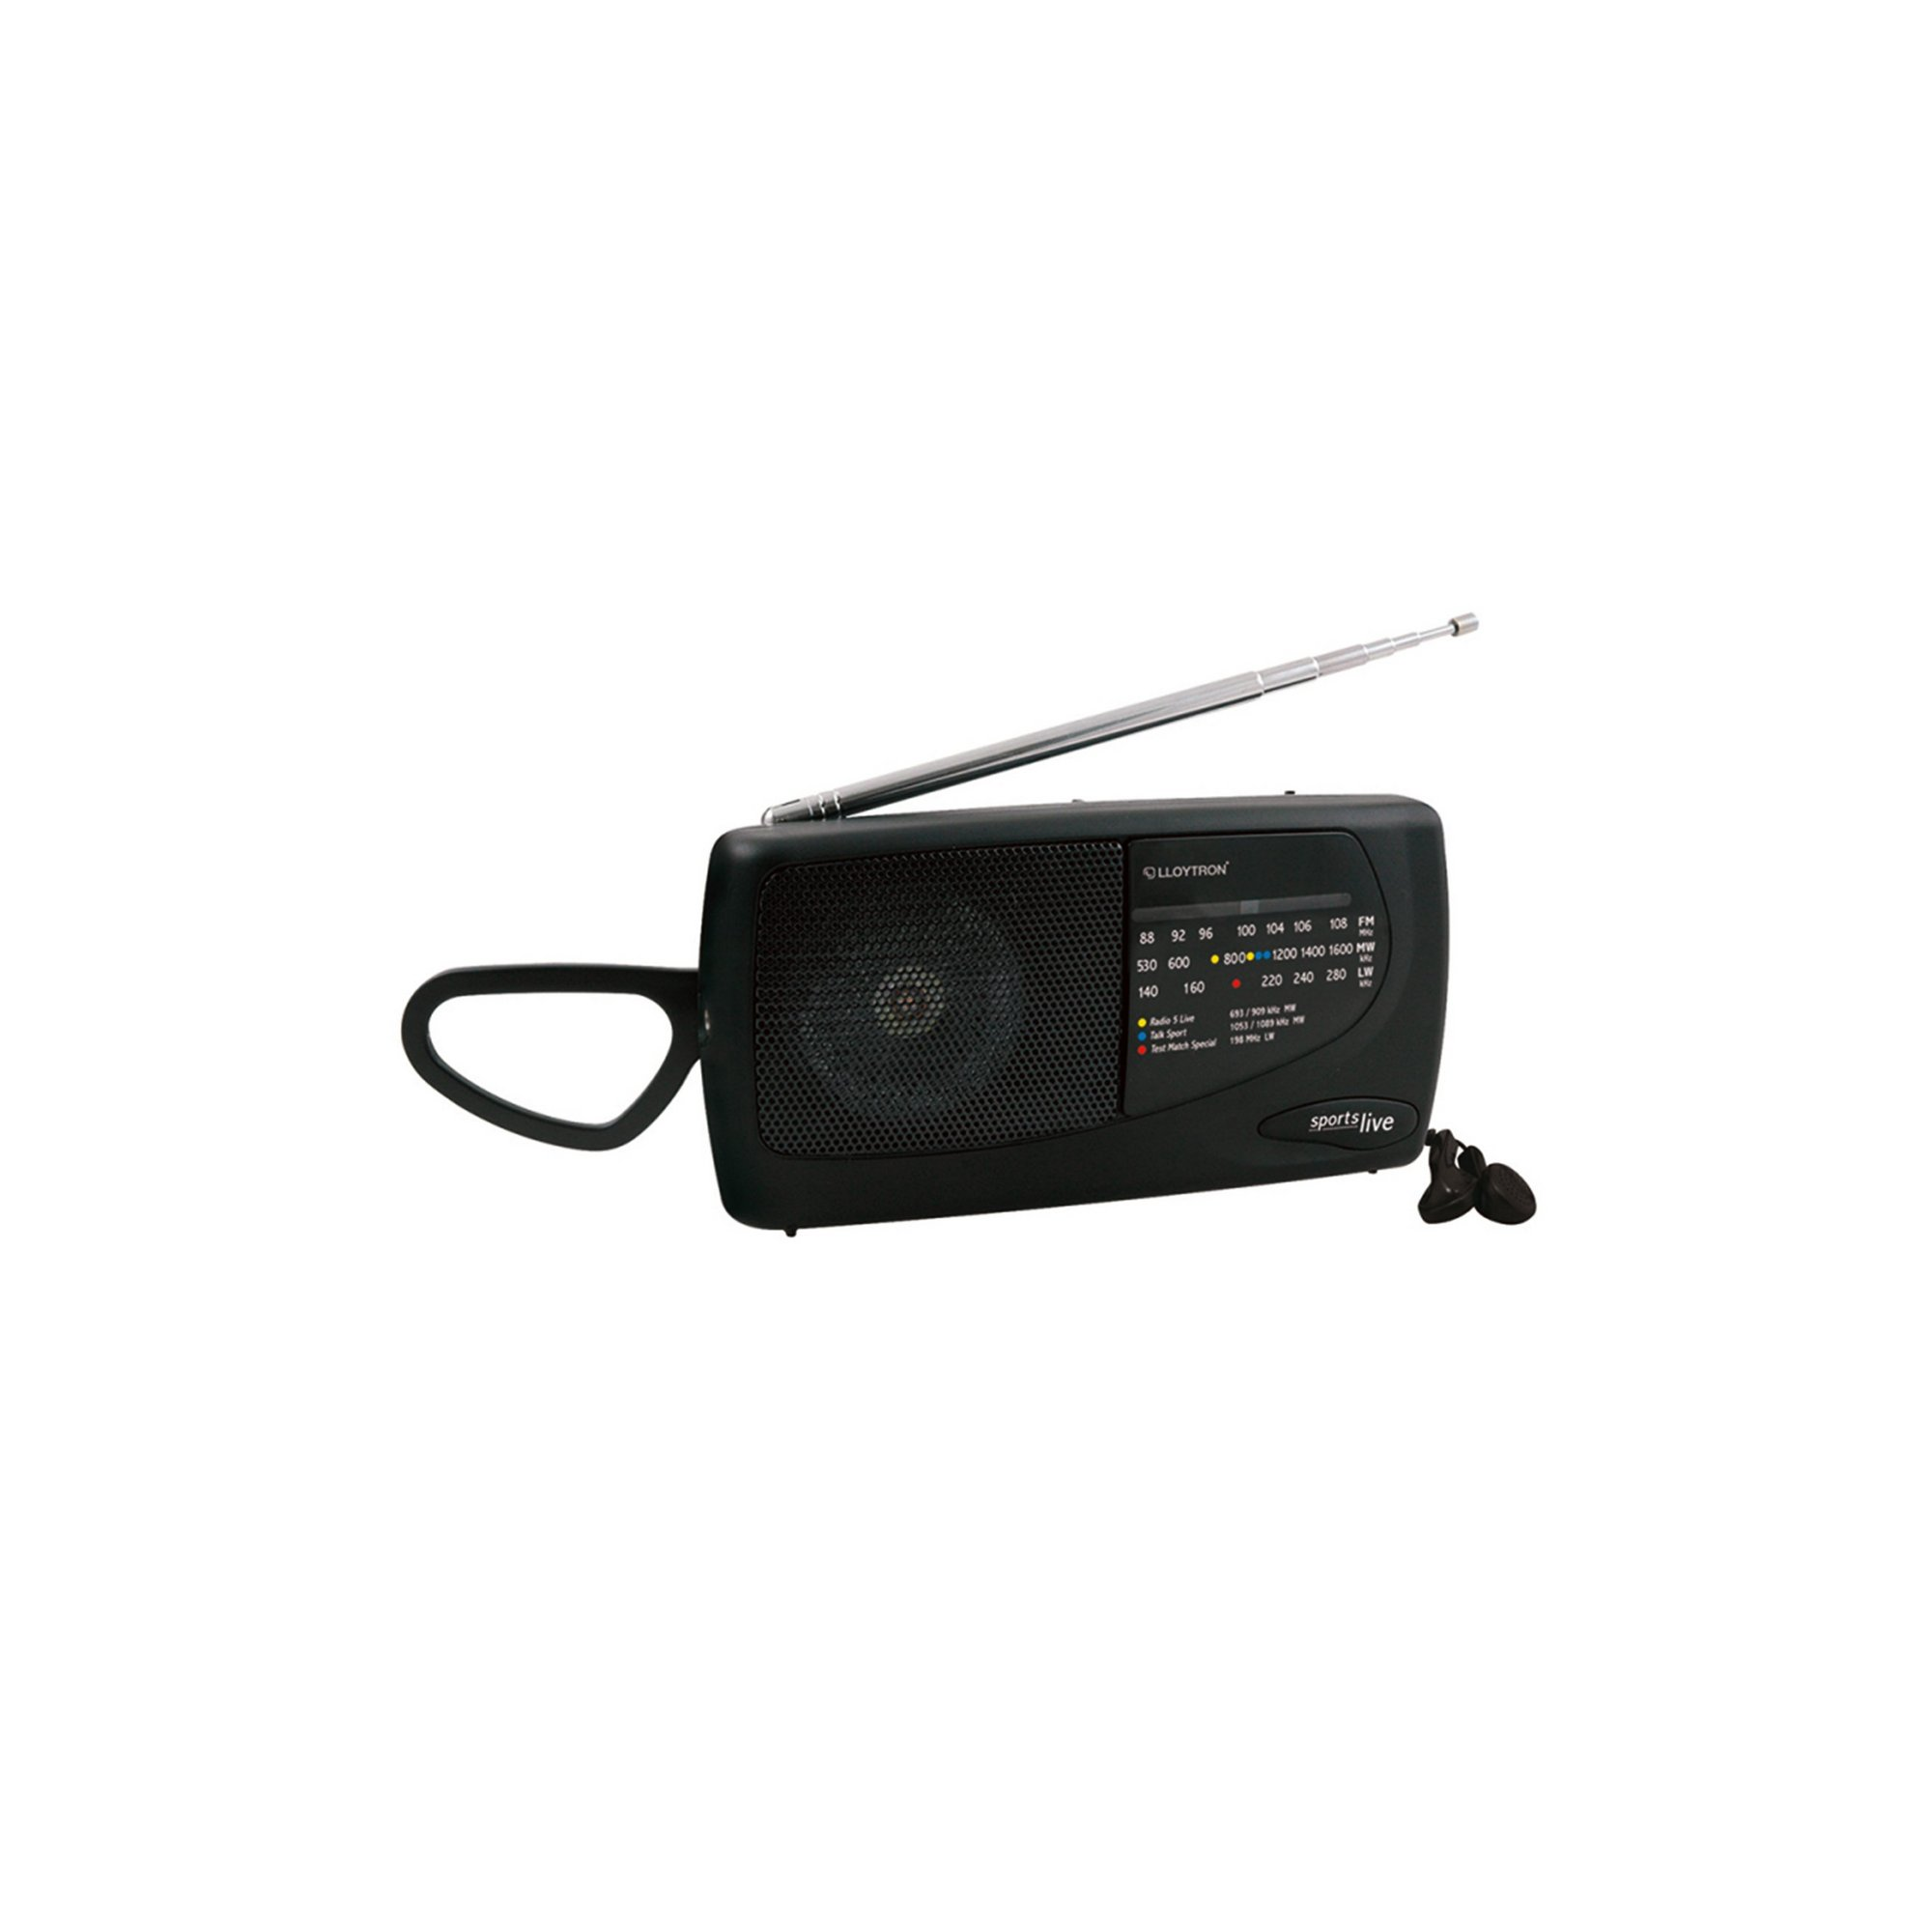 Image of Lloytron 3 Band Portable Radio